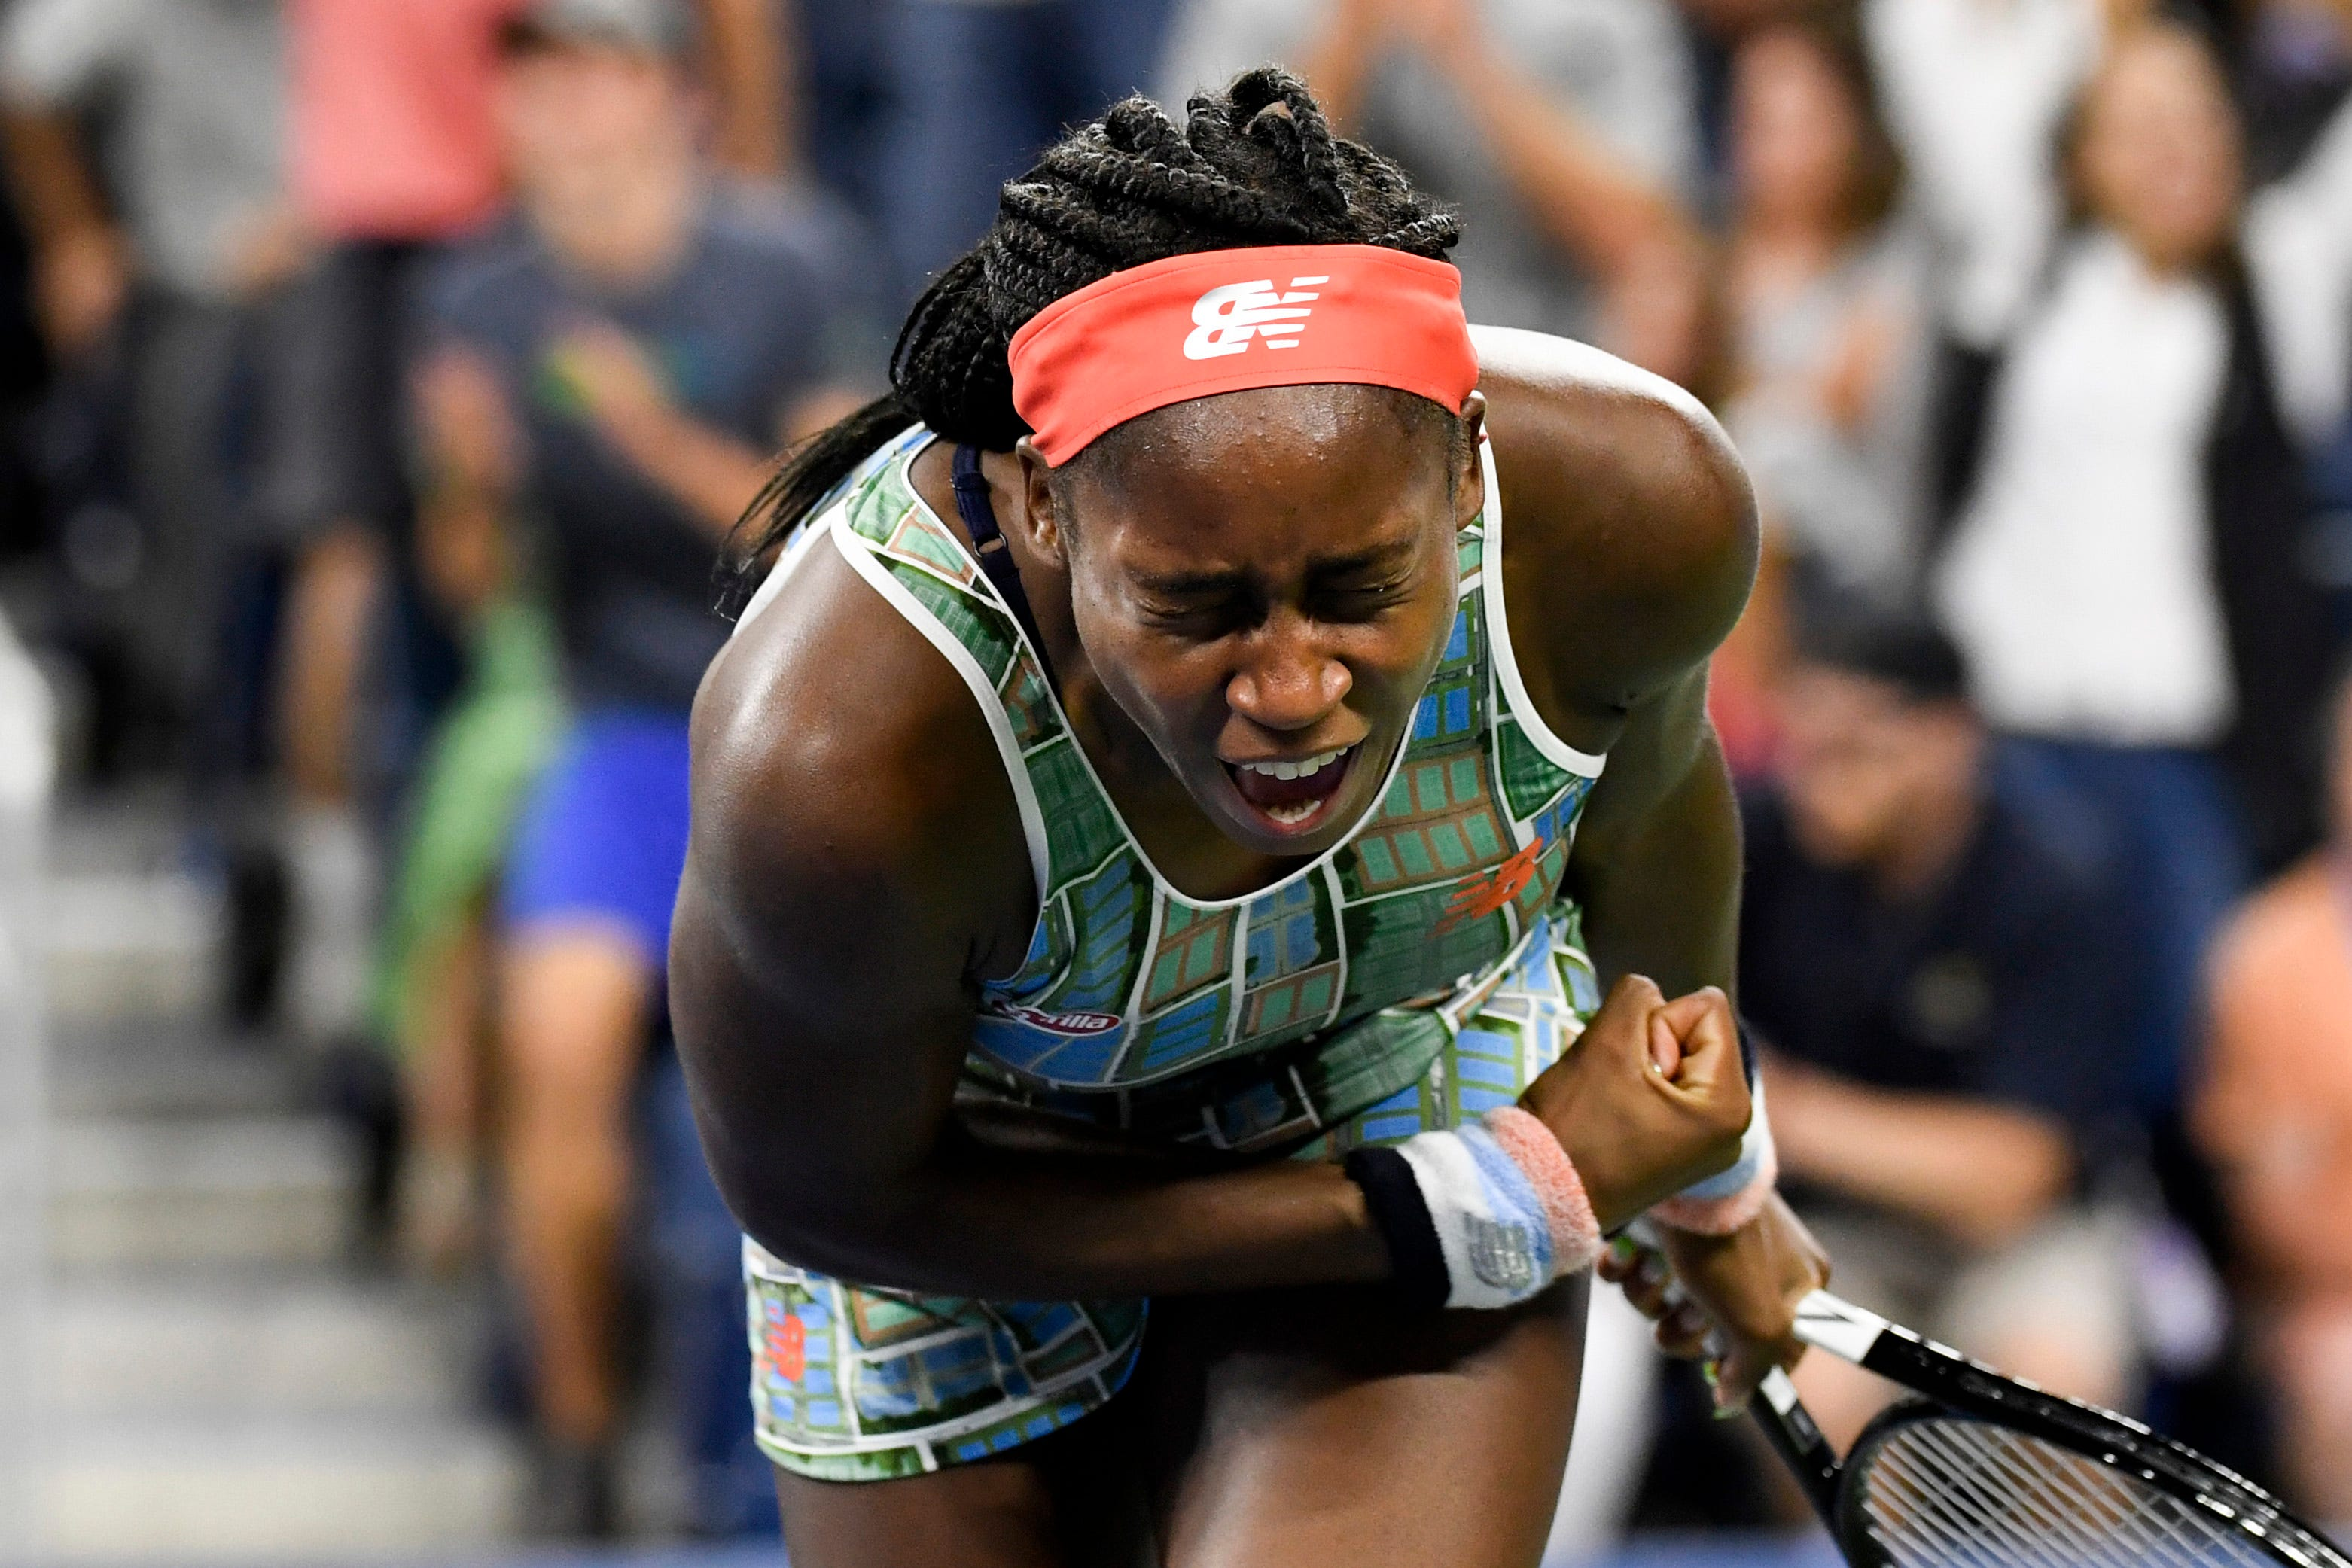 Meet 17-year-old tennis sensation Coco Gauff